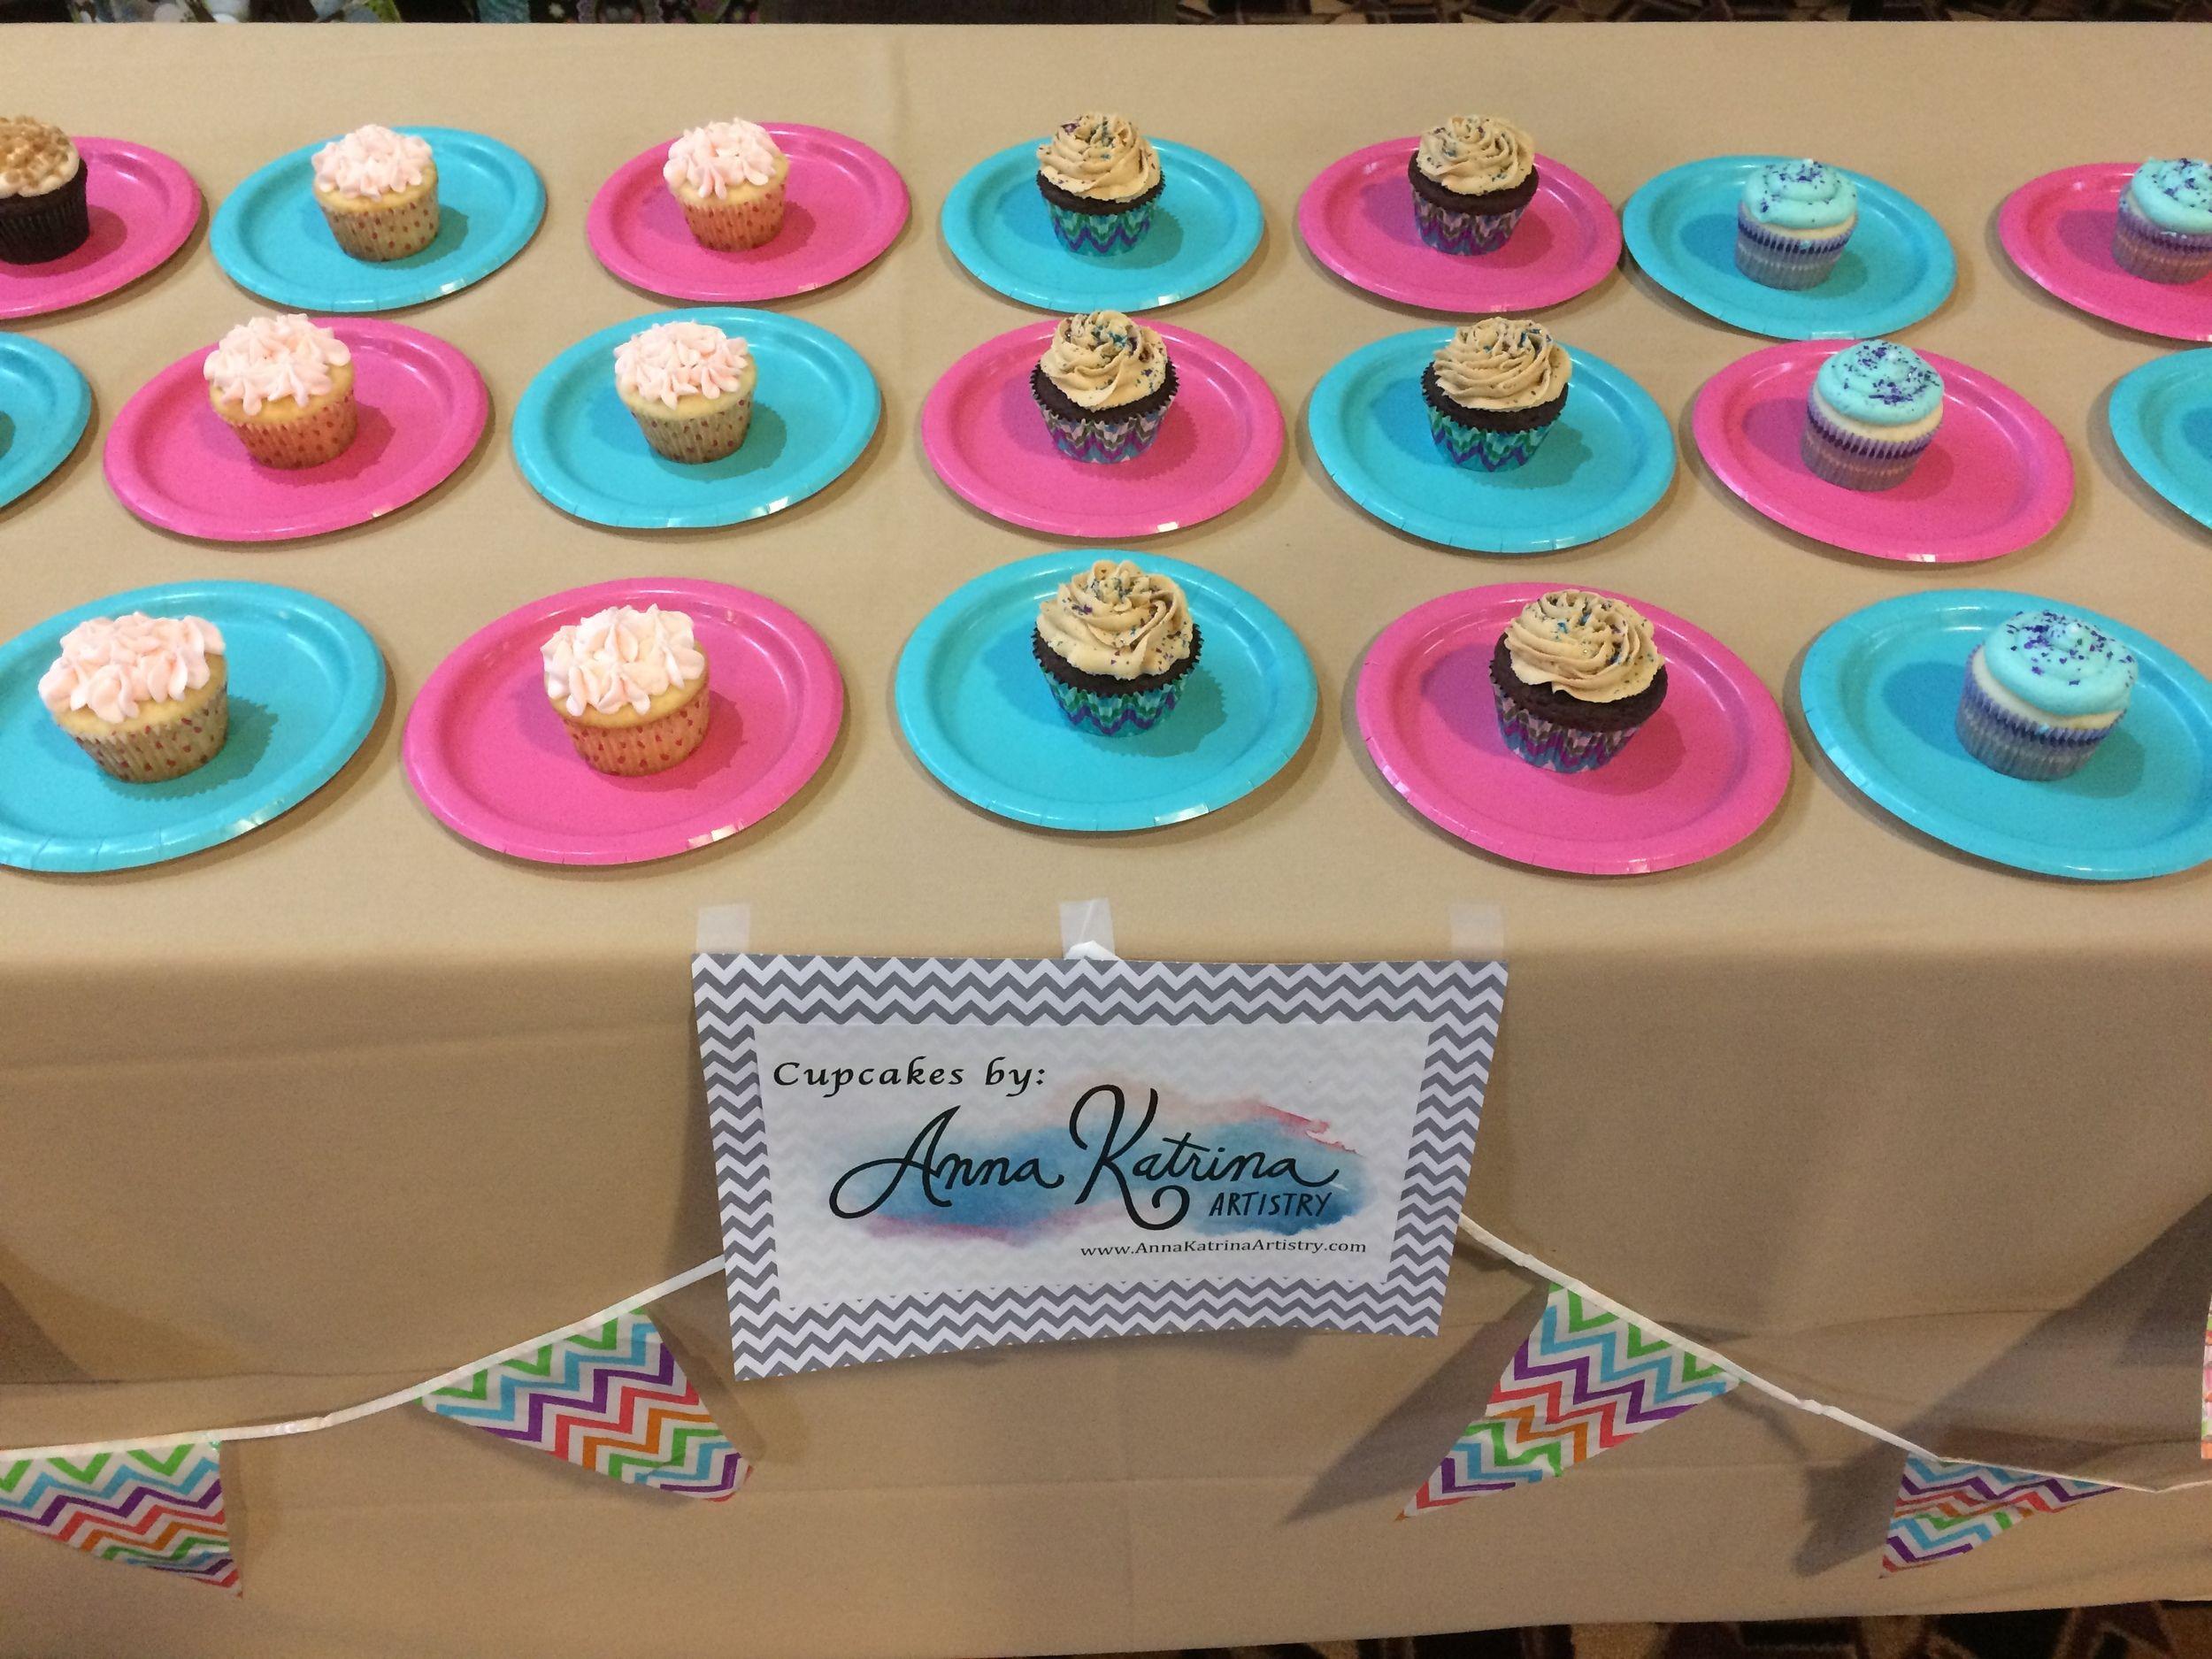 Delta Kappa Gamma Cupcake Sale With Images Cupcakes Baking